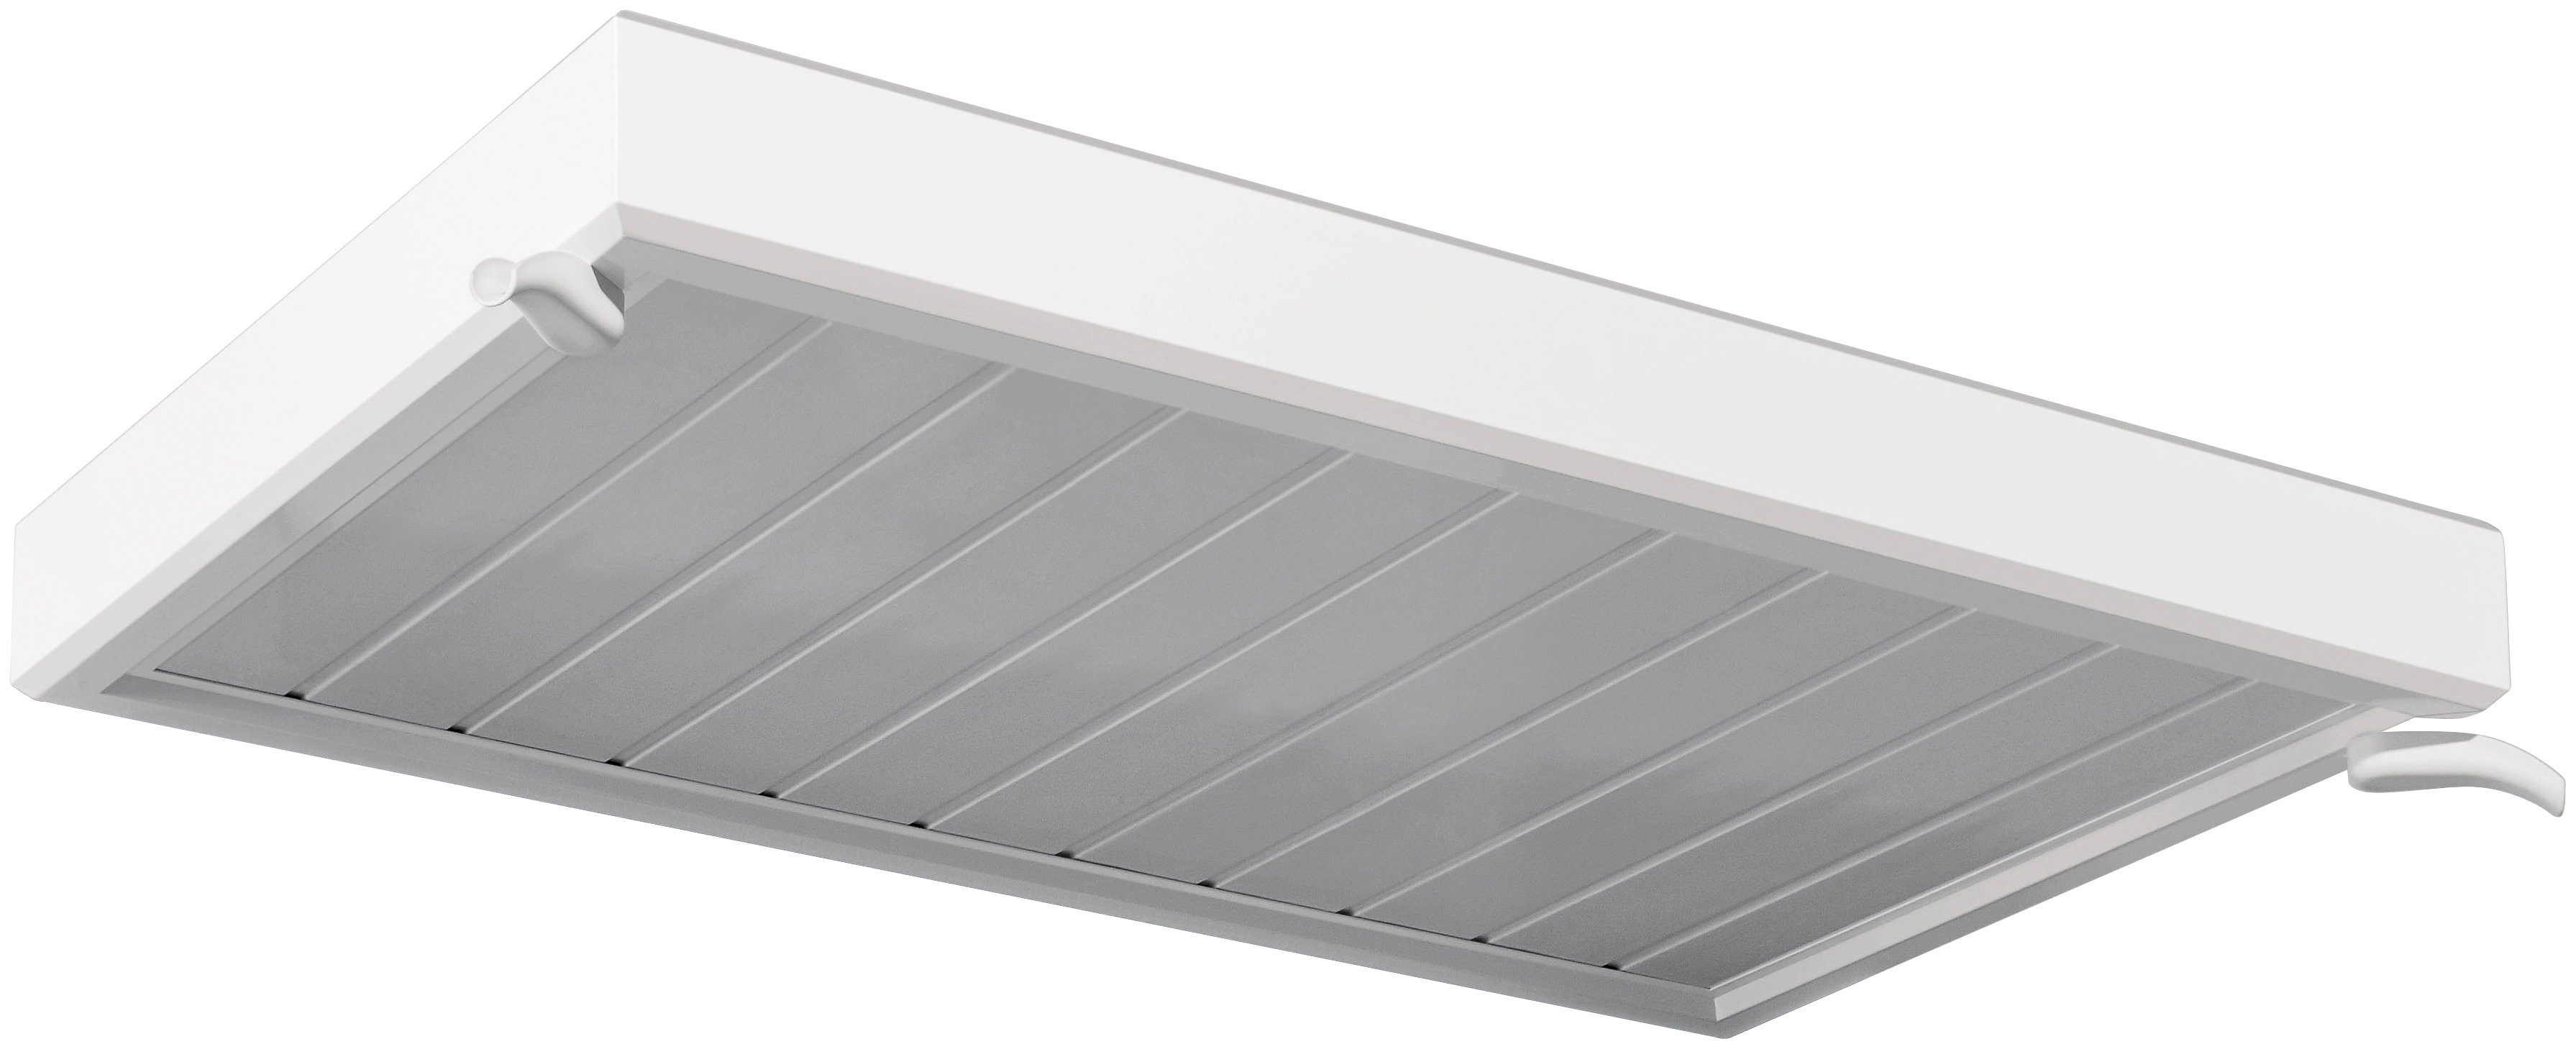 Vordach »TYP NM«, 150x90x14 cm, weiß